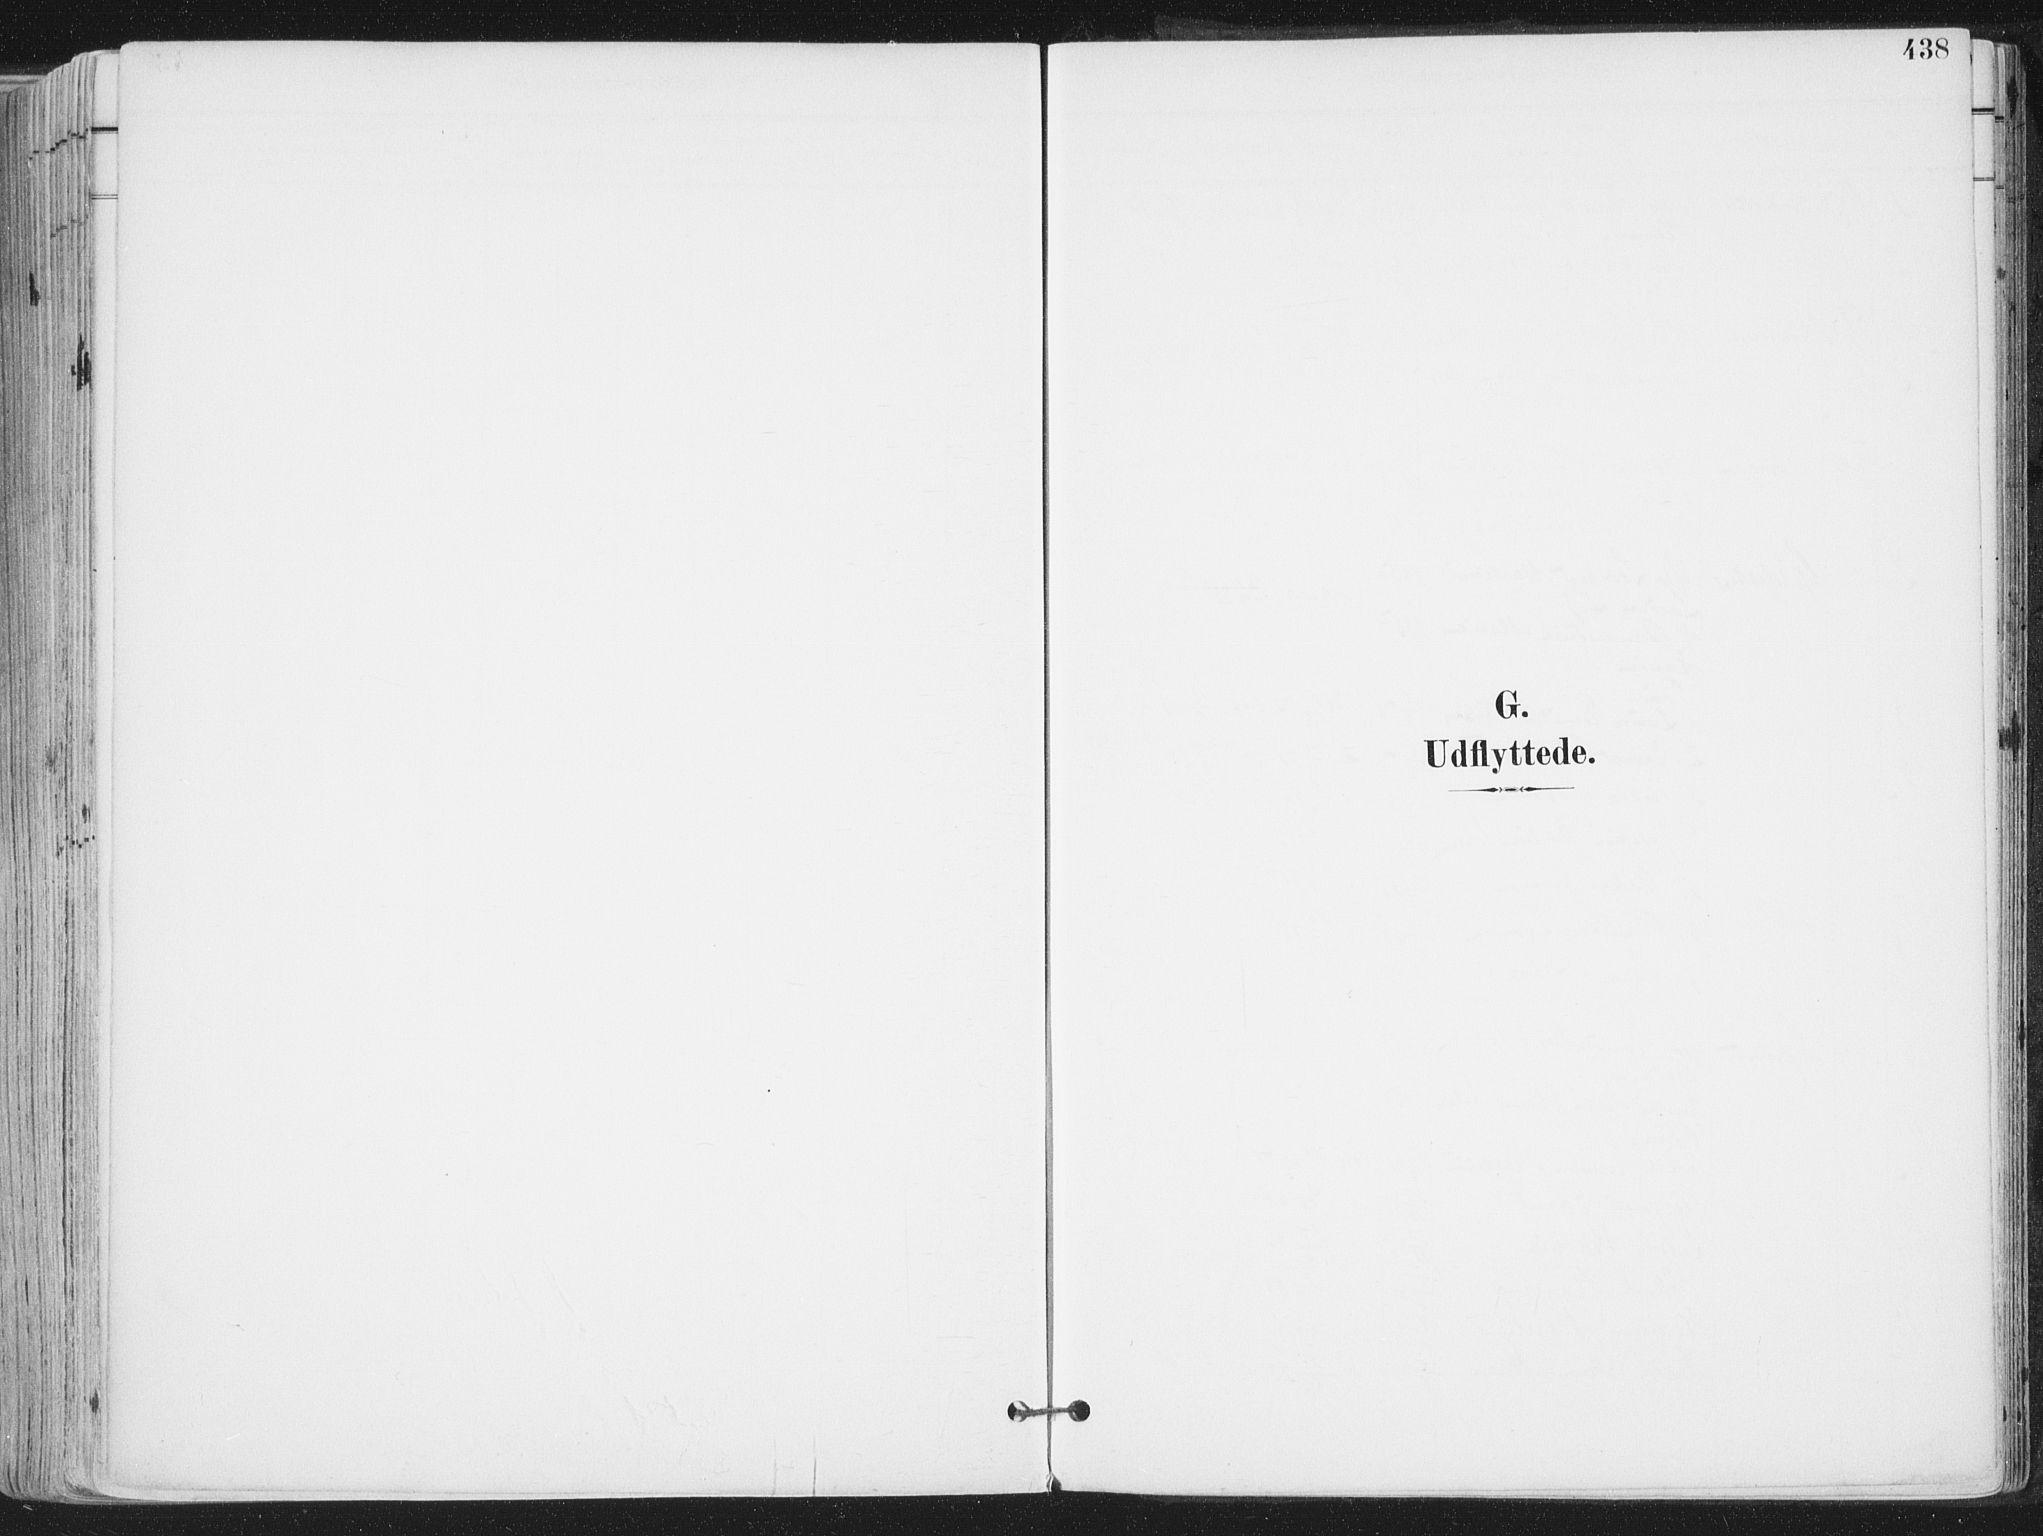 SAT, Ministerialprotokoller, klokkerbøker og fødselsregistre - Nordland, 802/L0055: Ministerialbok nr. 802A02, 1894-1915, s. 438